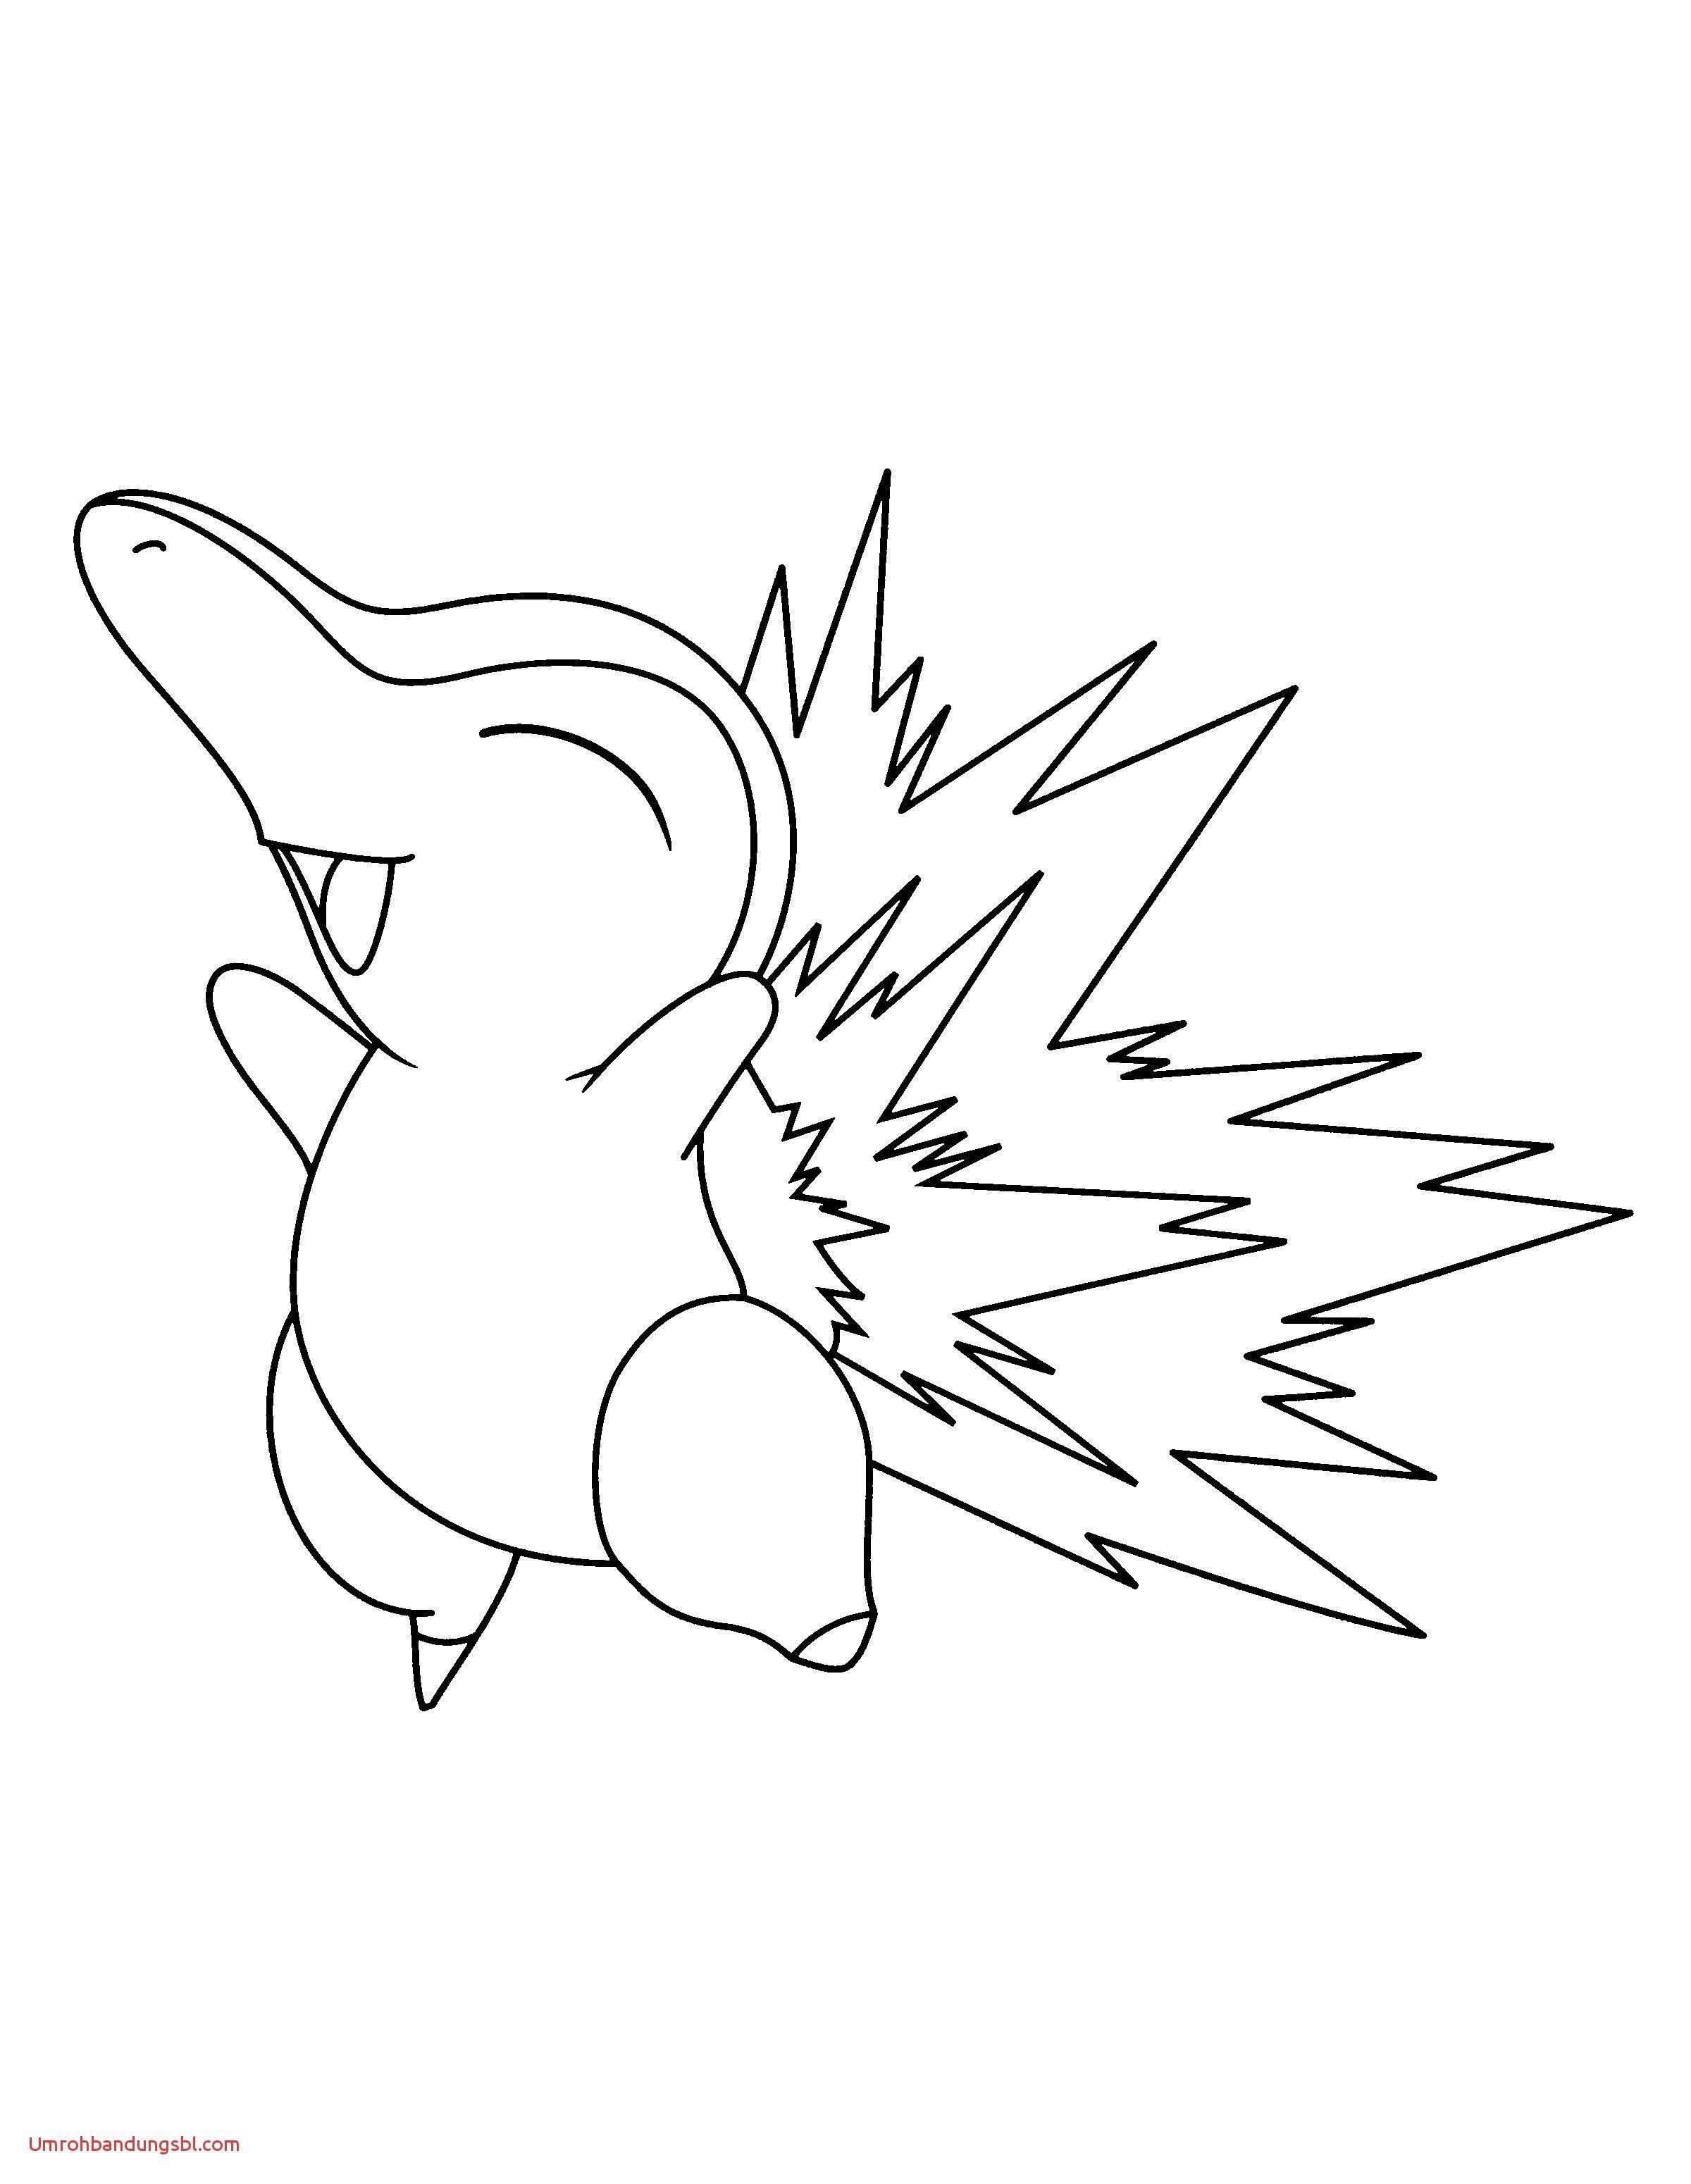 Frisch Quad Malvorlagen Gratis  Pokemon coloring pages, Pokemon